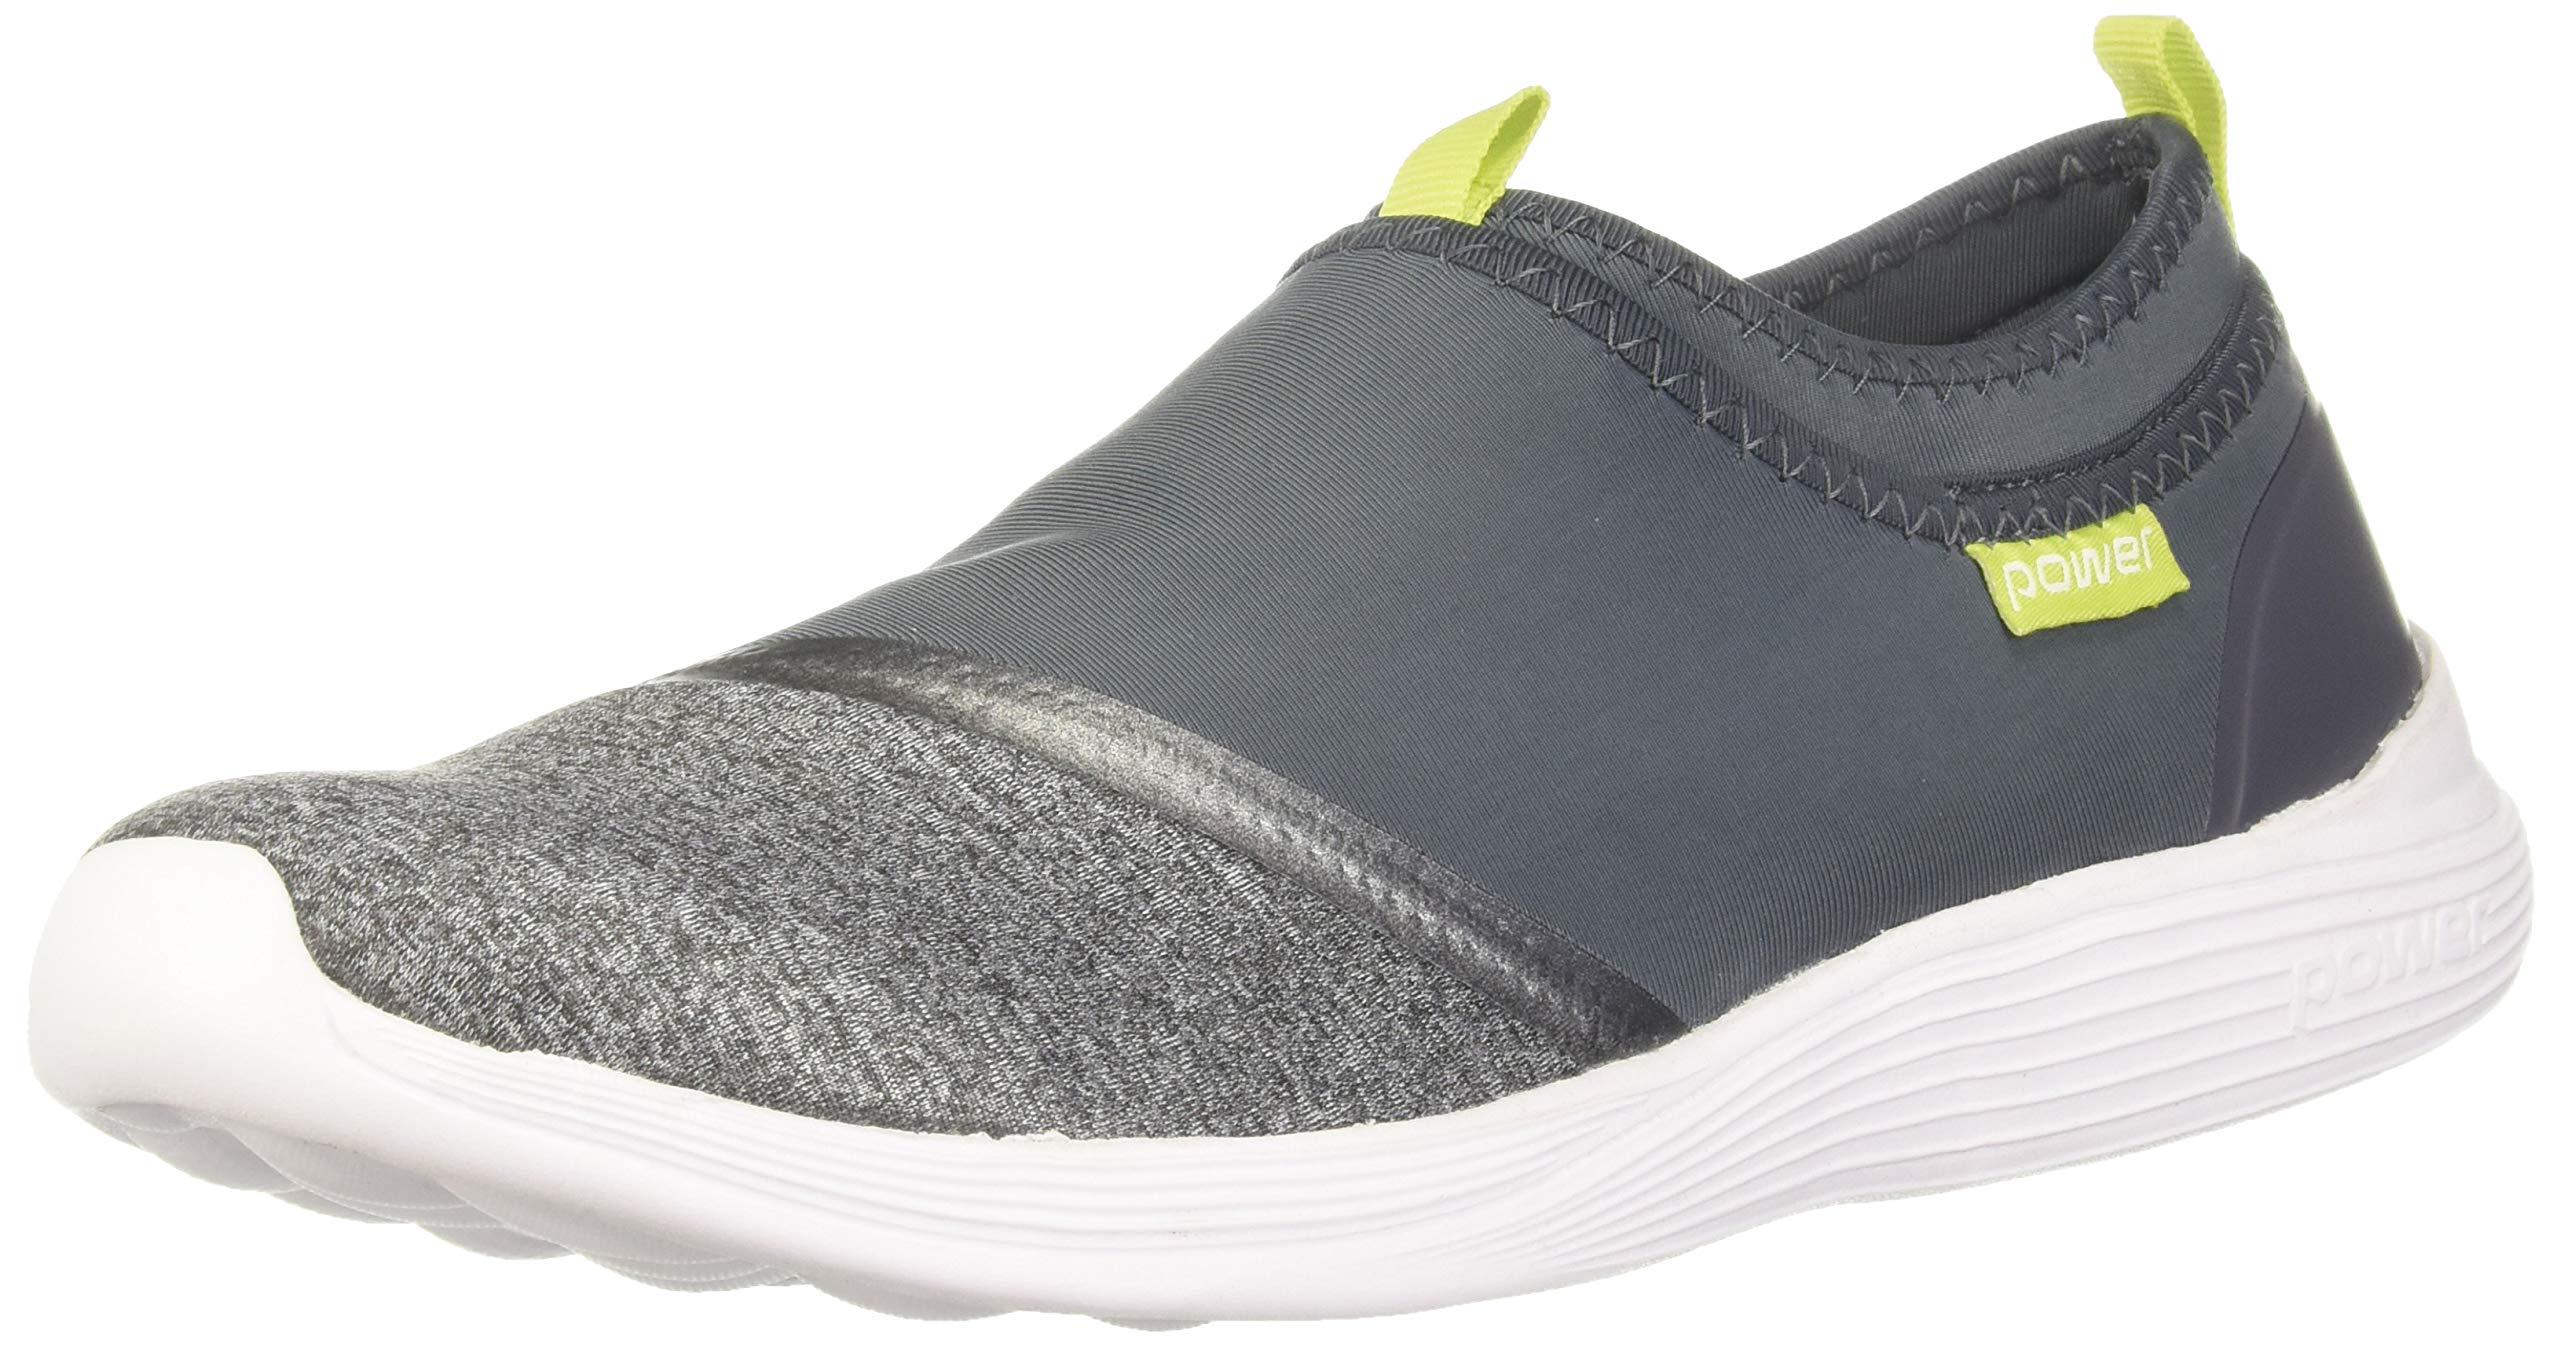 Power Men's Glide Vapor Grey Running Shoes-10 UK (44 EU) (8392367) (B07XS1LN4W) Amazon Price History, Amazon Price Tracker